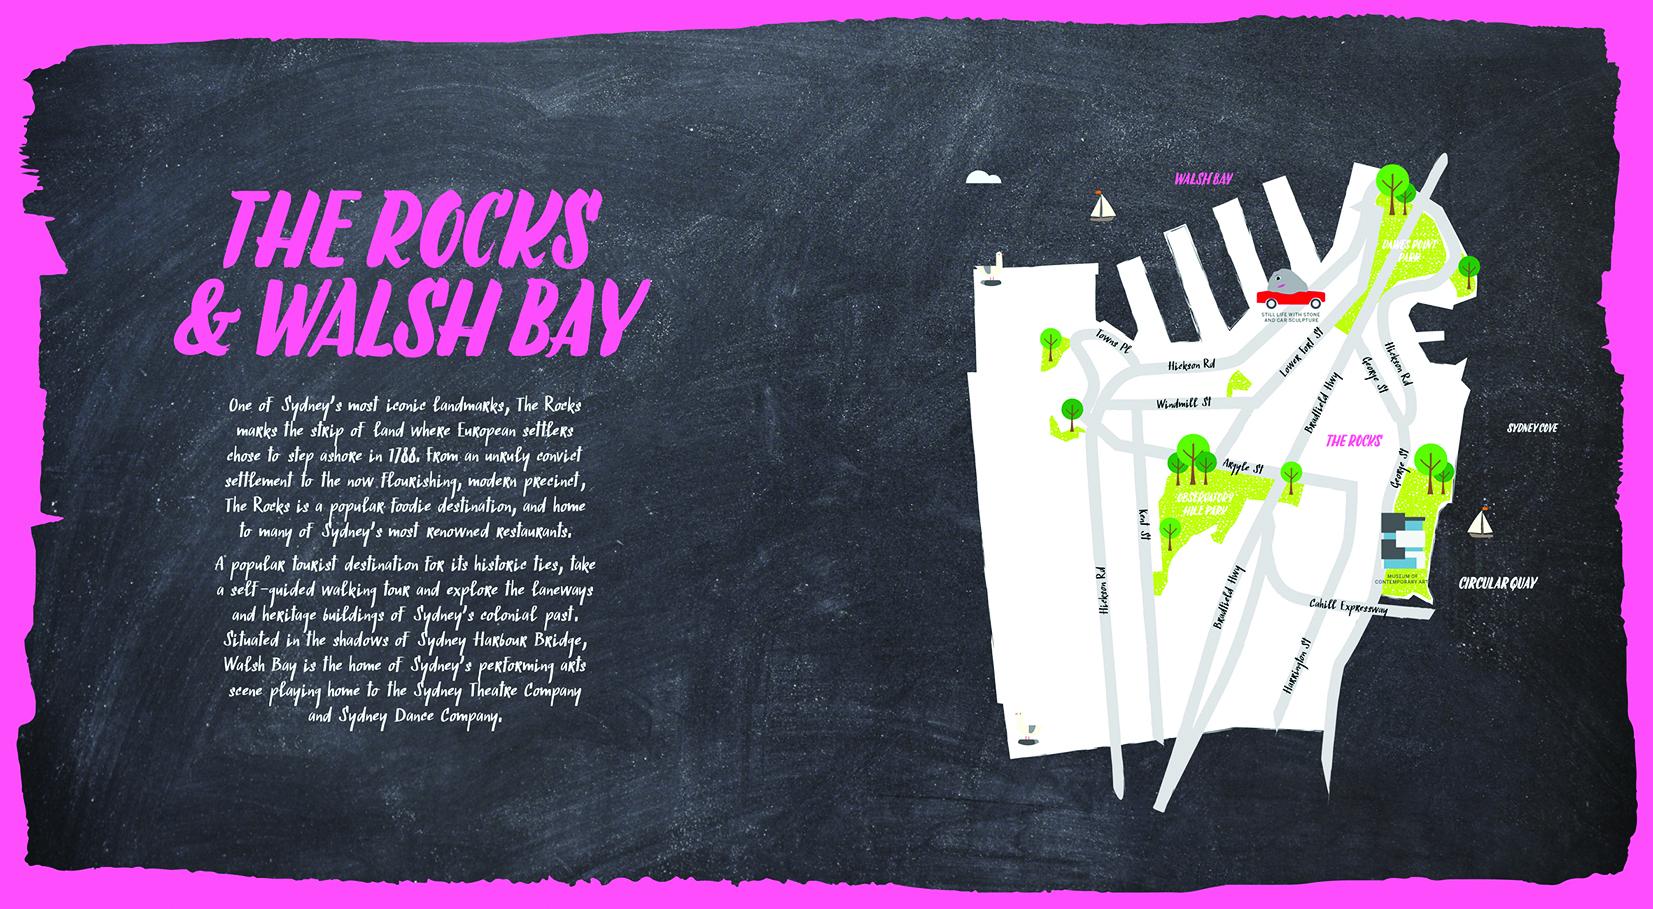 Flavours-of-Sydney-pg416.jpg